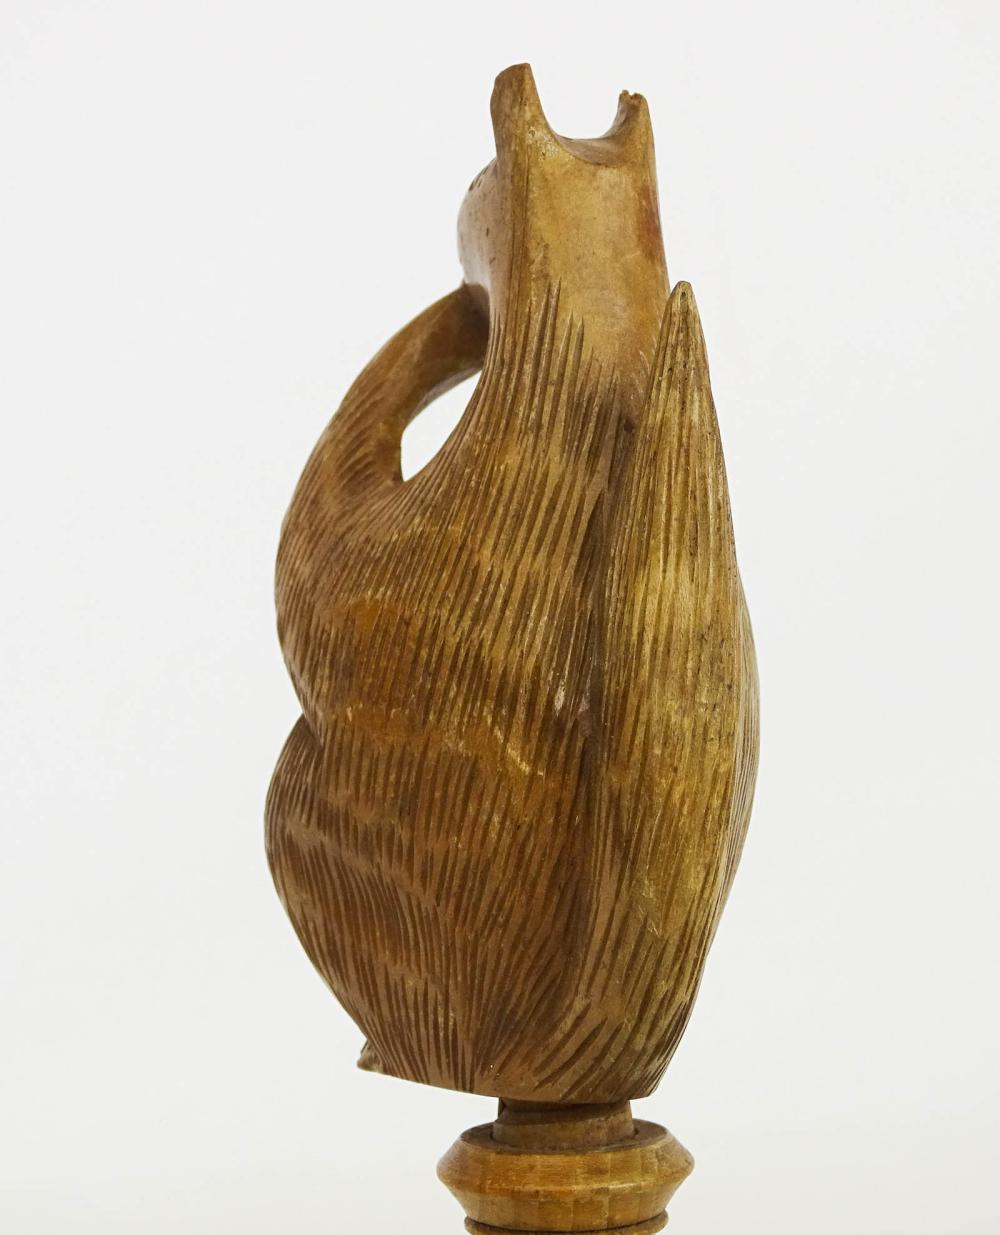 Lot 27: Carved Squirrel Nutcracker